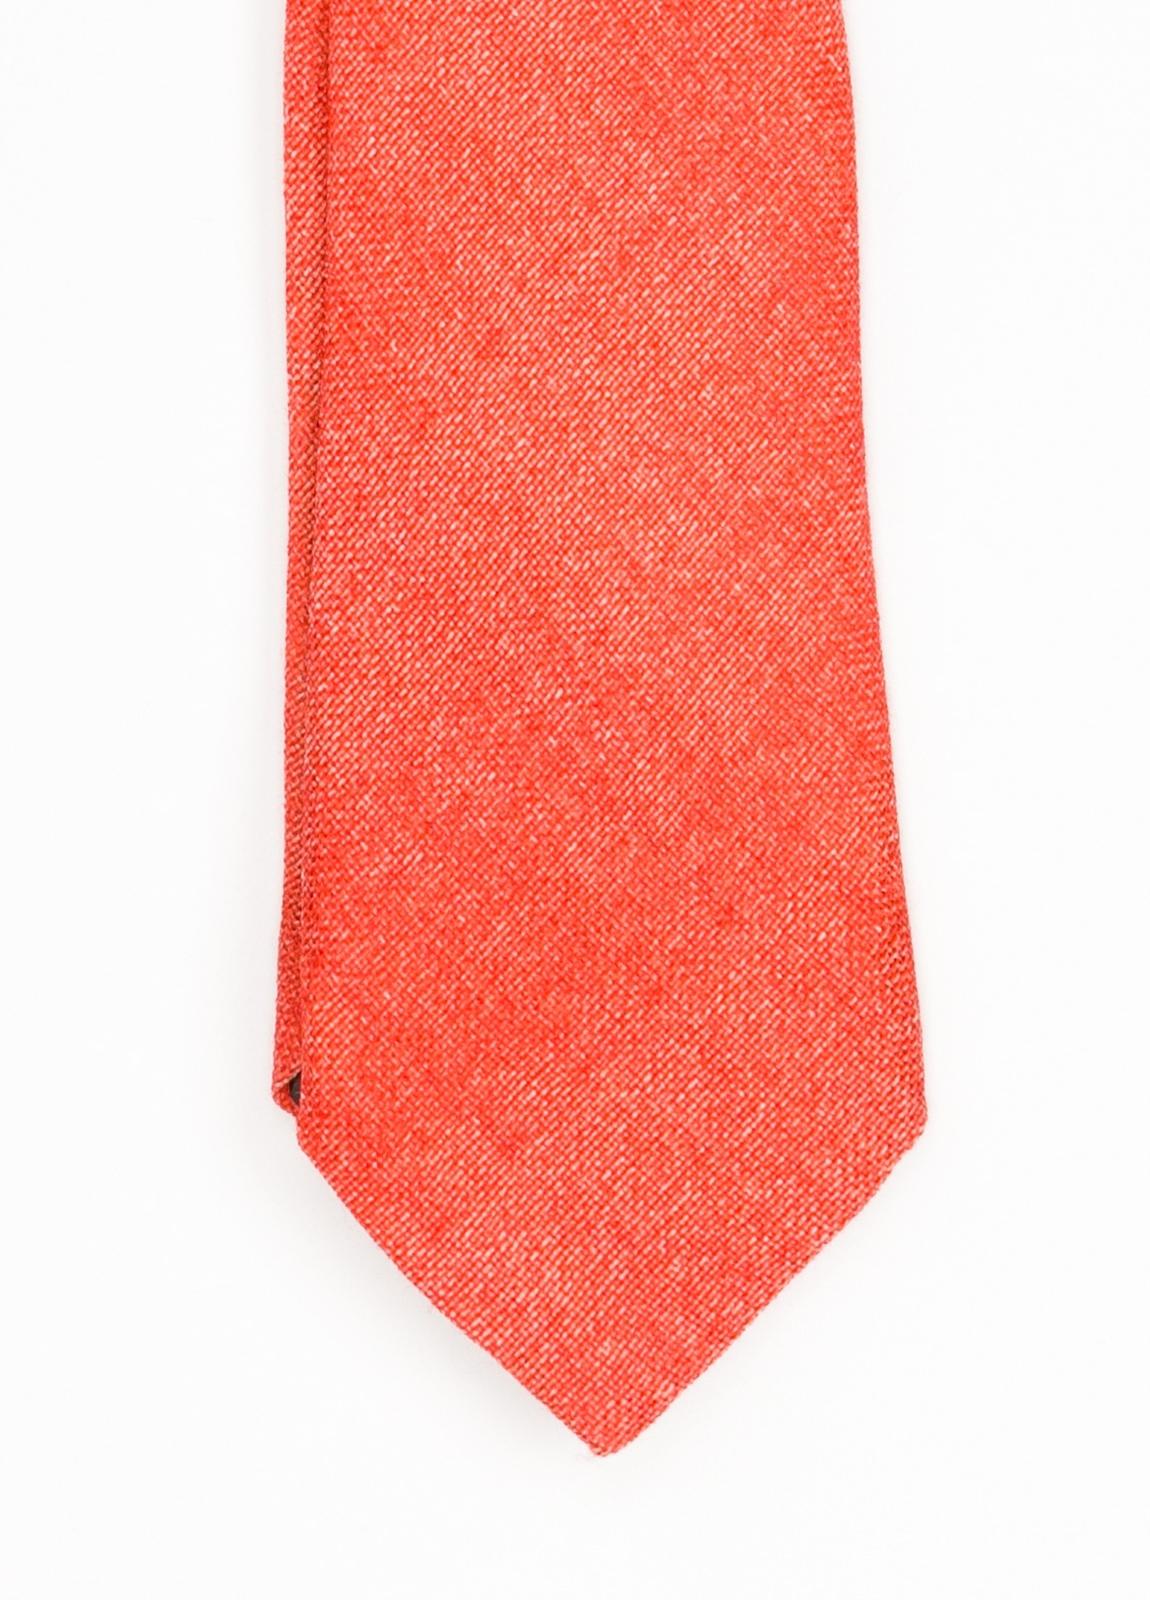 Corbata Formal Wear microtextura, color rojo. Pala 7,5 cm. 100% Lana.